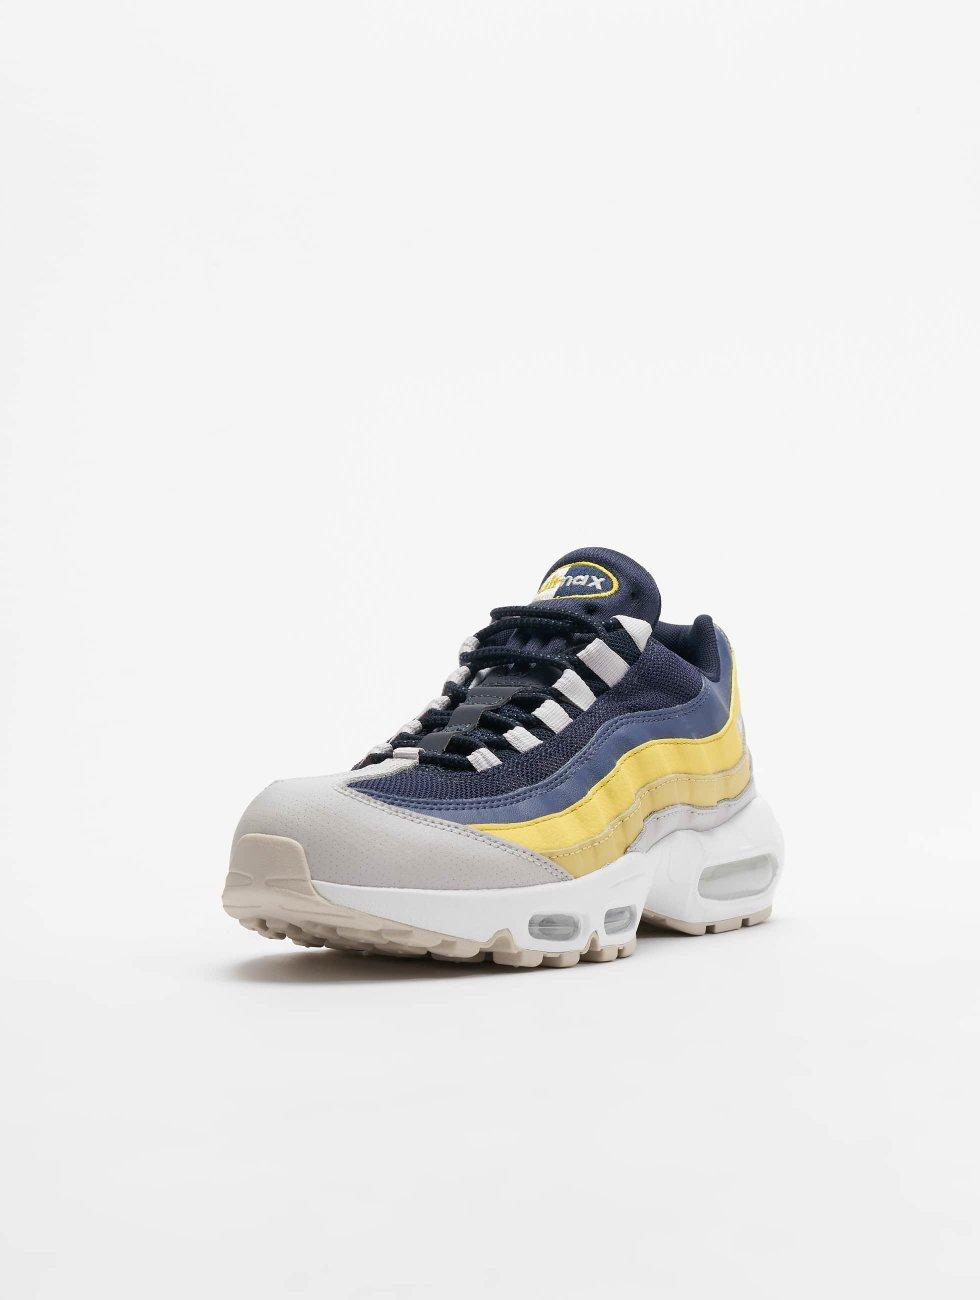 Nike Schoen / Sneaker Air Max 95 Essenziale Ingegno 442.633 j4CJmqmXM7